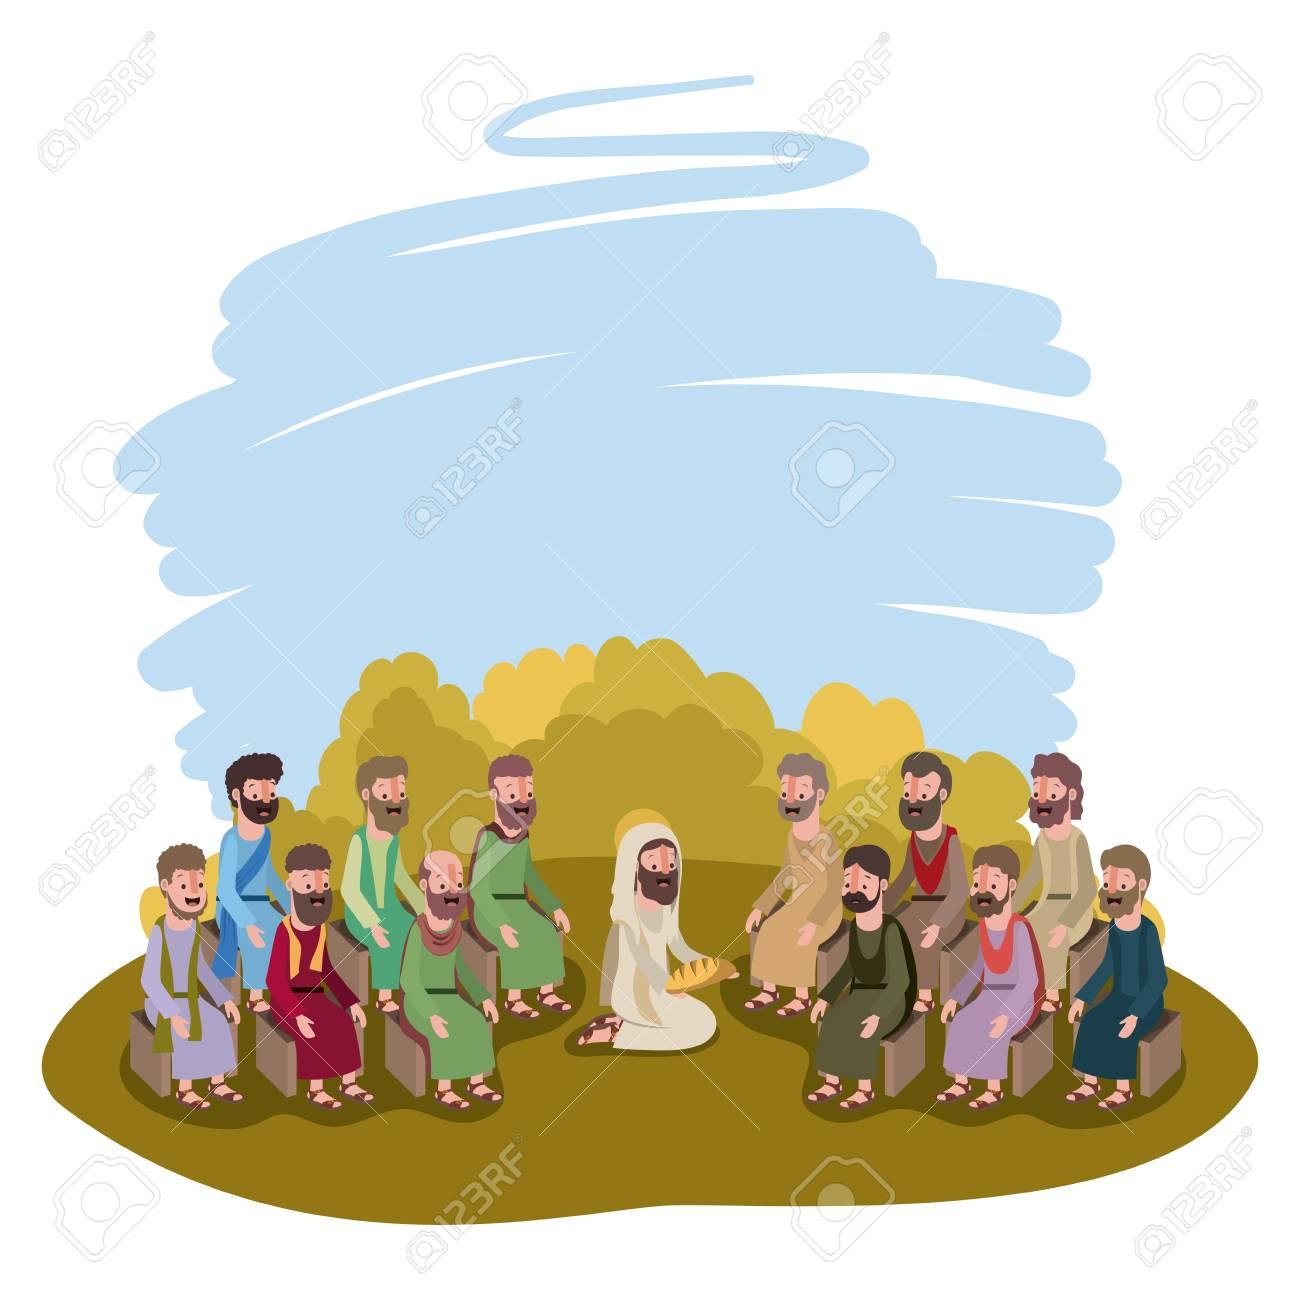 Jesus Christ praying with apostles biblical scene vector illustration...